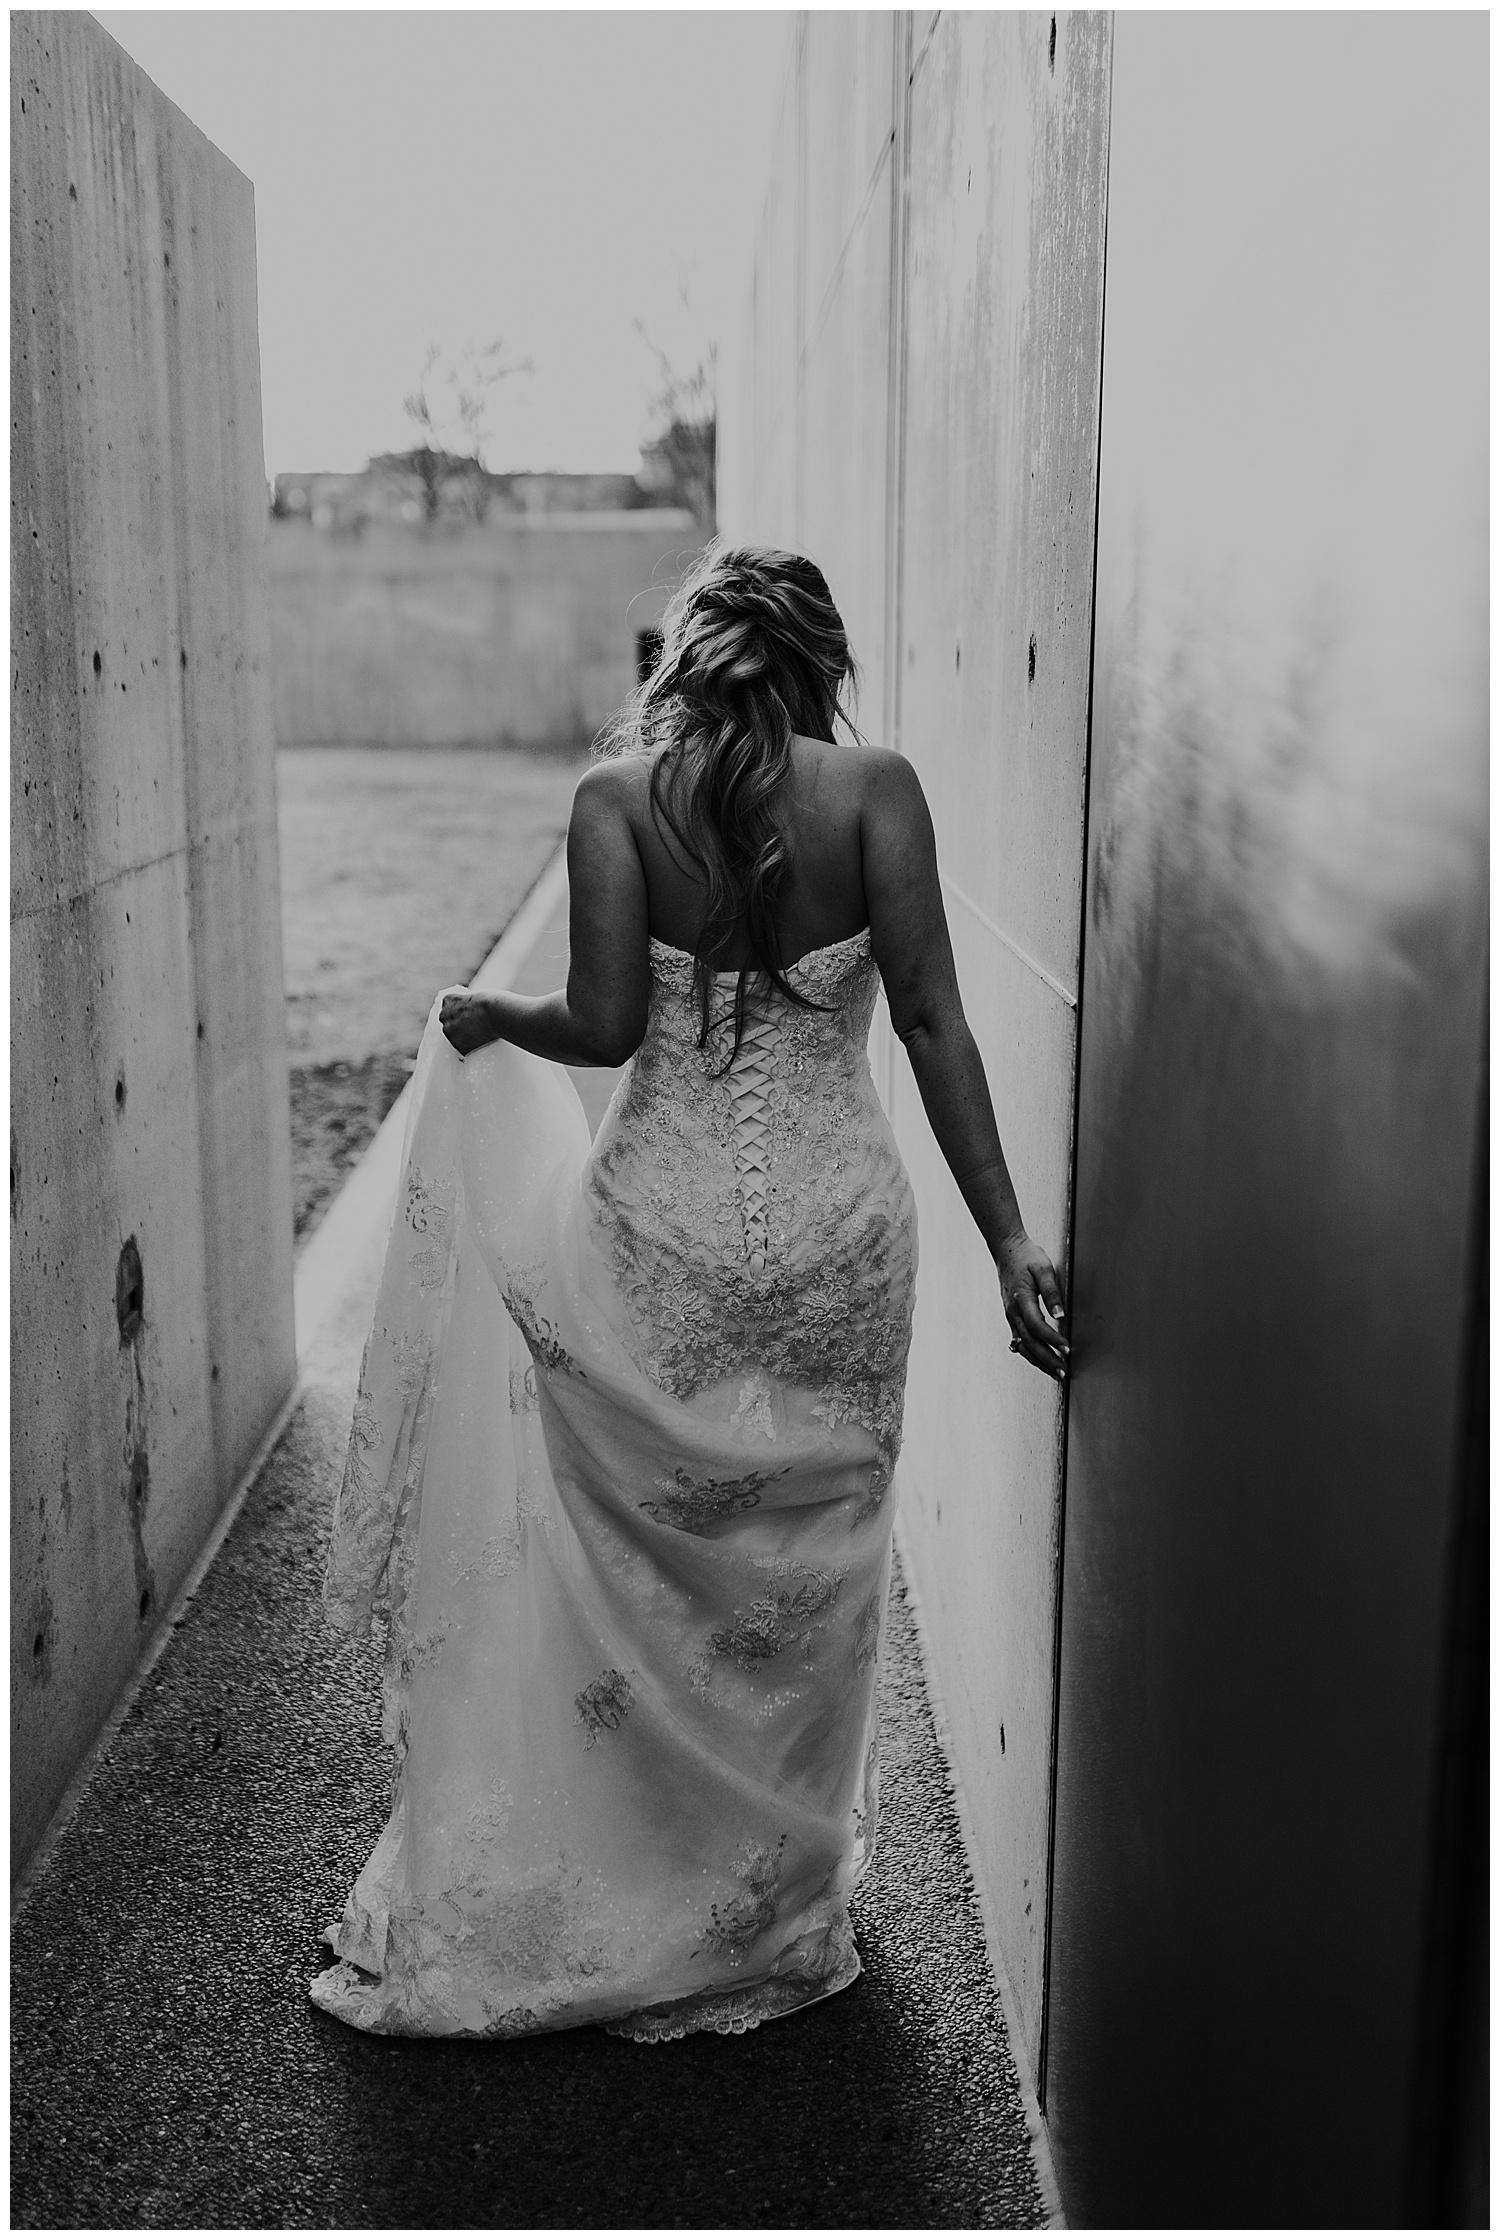 Laken-Mackenzie-Photography-Alyssa-Bridals-Kimbell-Art-Museum-Dallas-Fort-Worth-Wedding-Photographer19.jpg